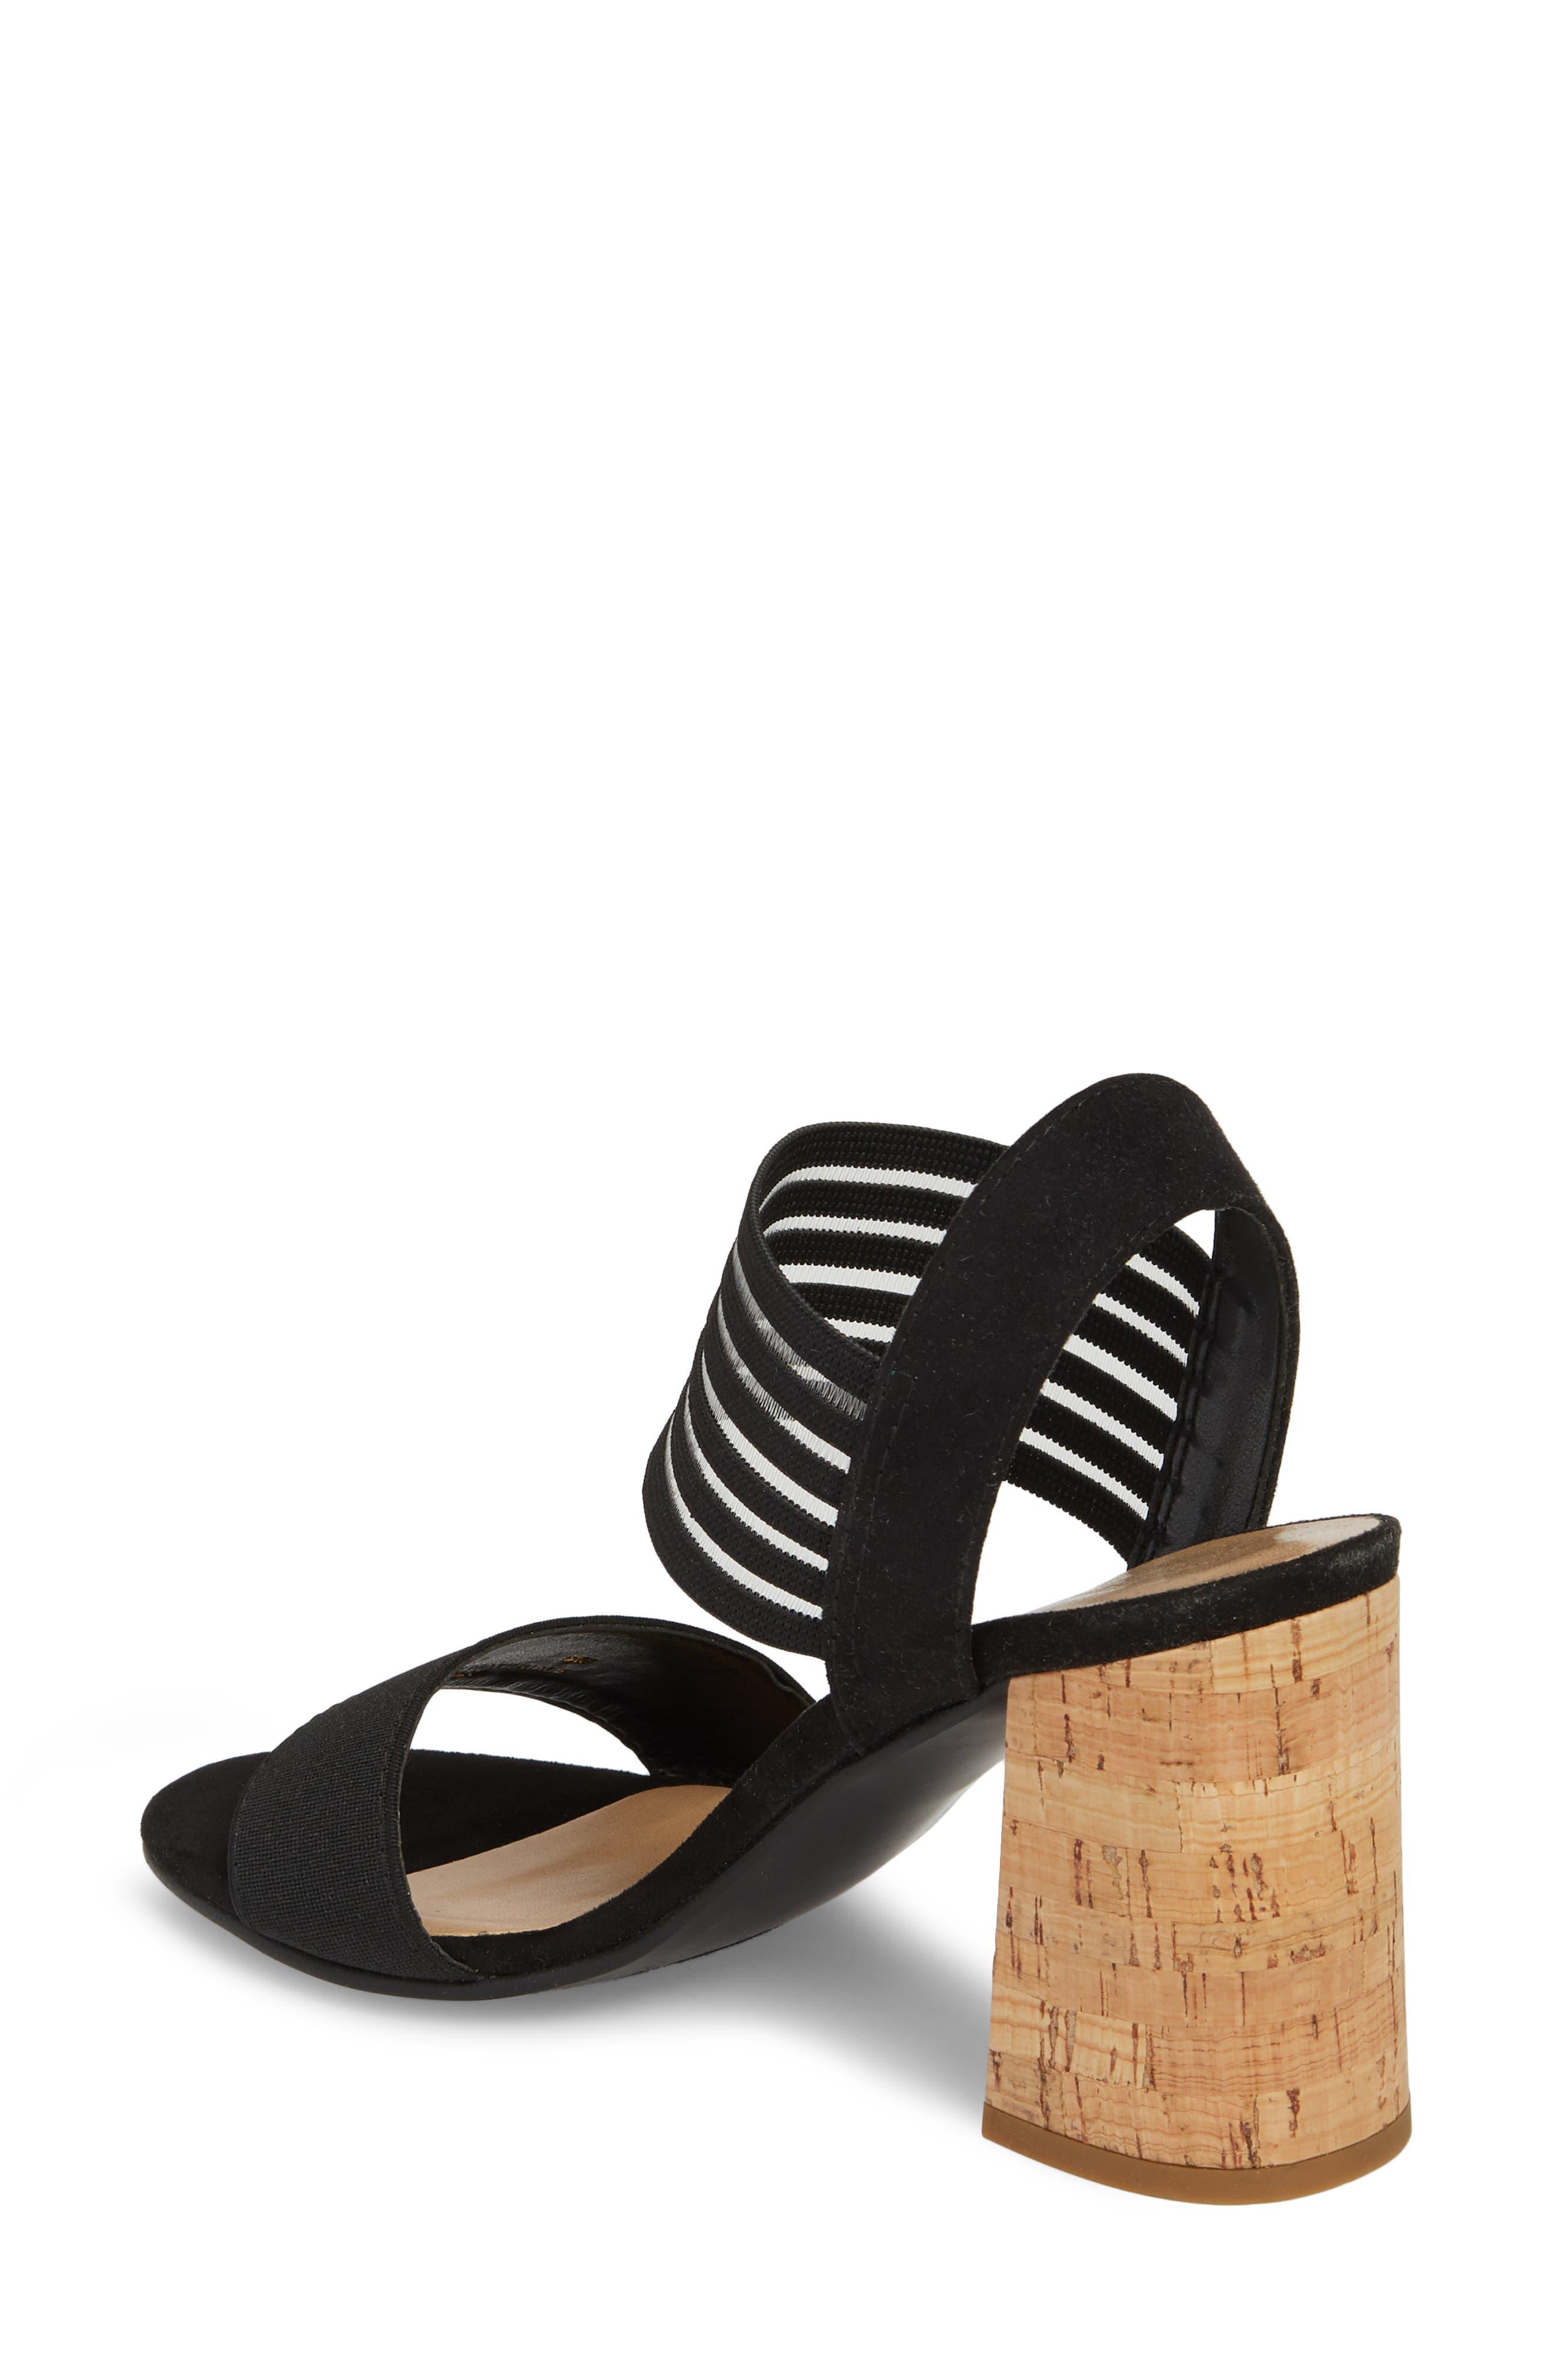 Dan Block Heel Sandal,                             Alternate thumbnail 2, color,                             BLACK LEATHER